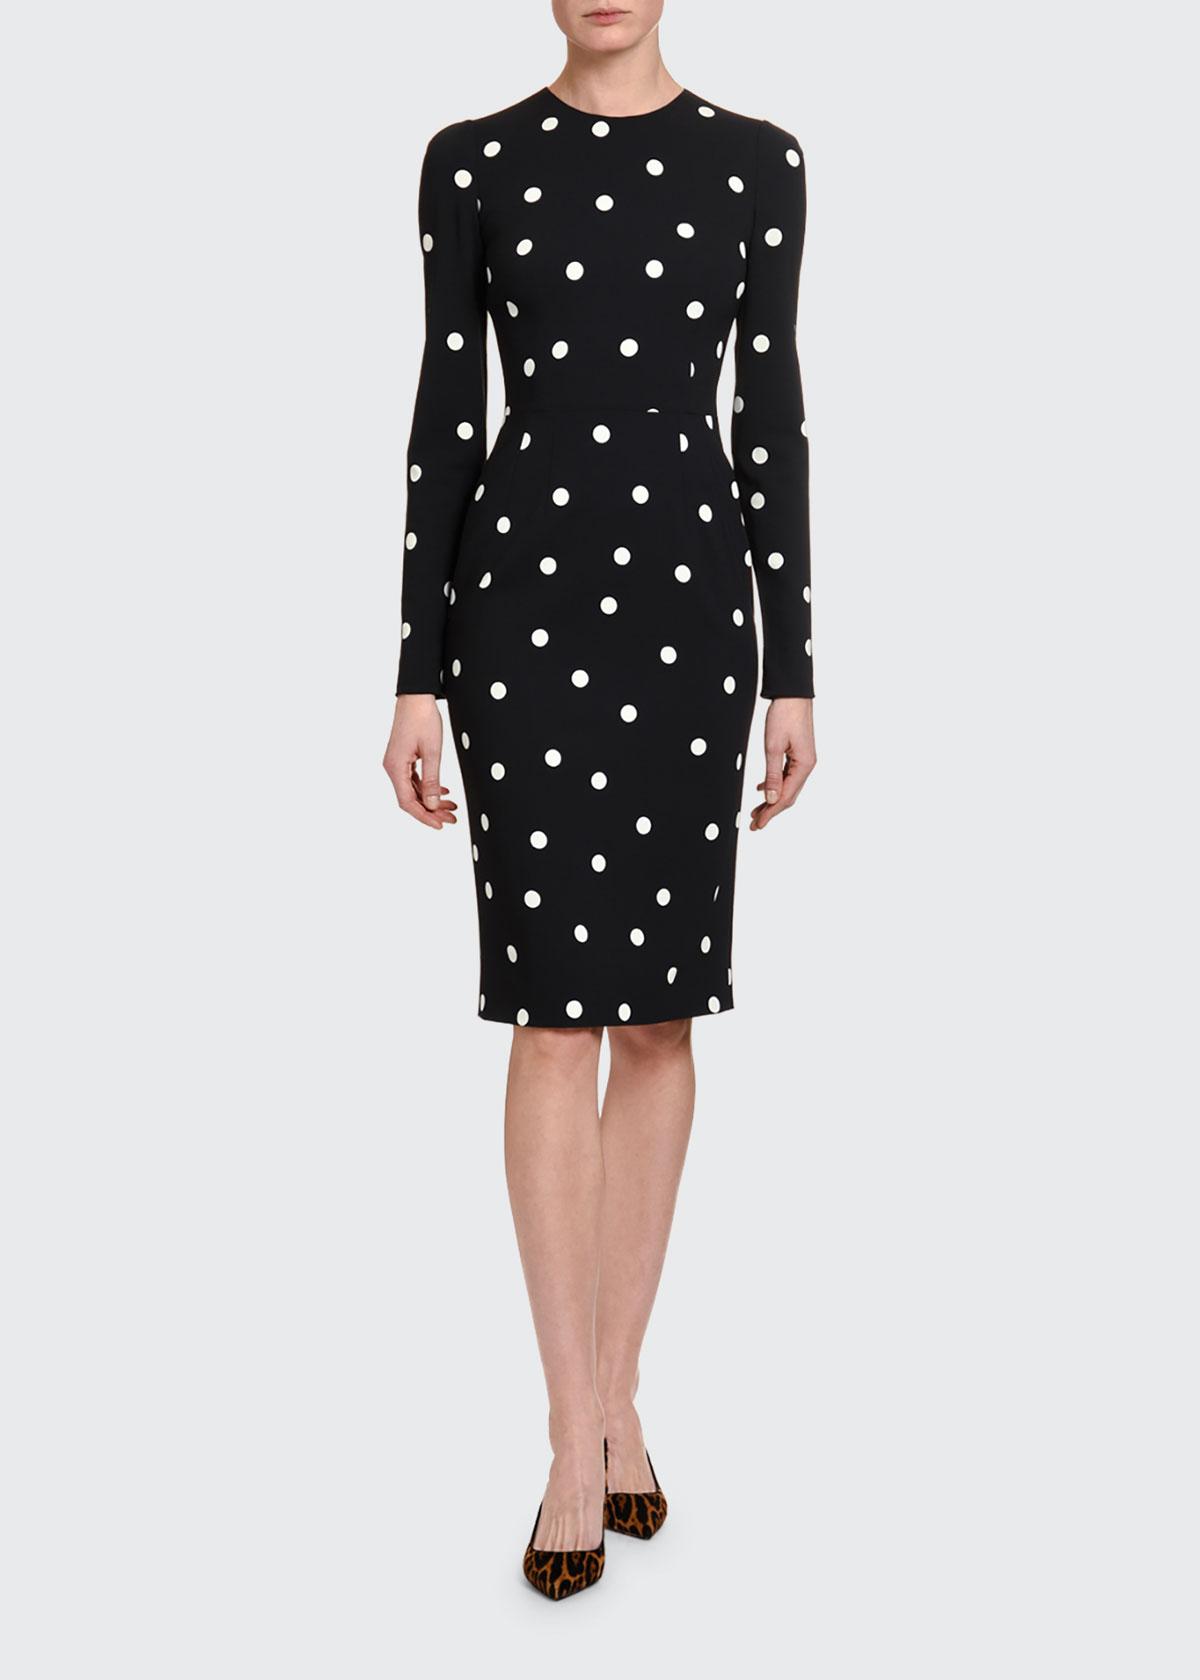 Dolce & Gabbana Dresses LONG-SLEEVE POLKA-DOT CASHMERE BODYCON DRESS